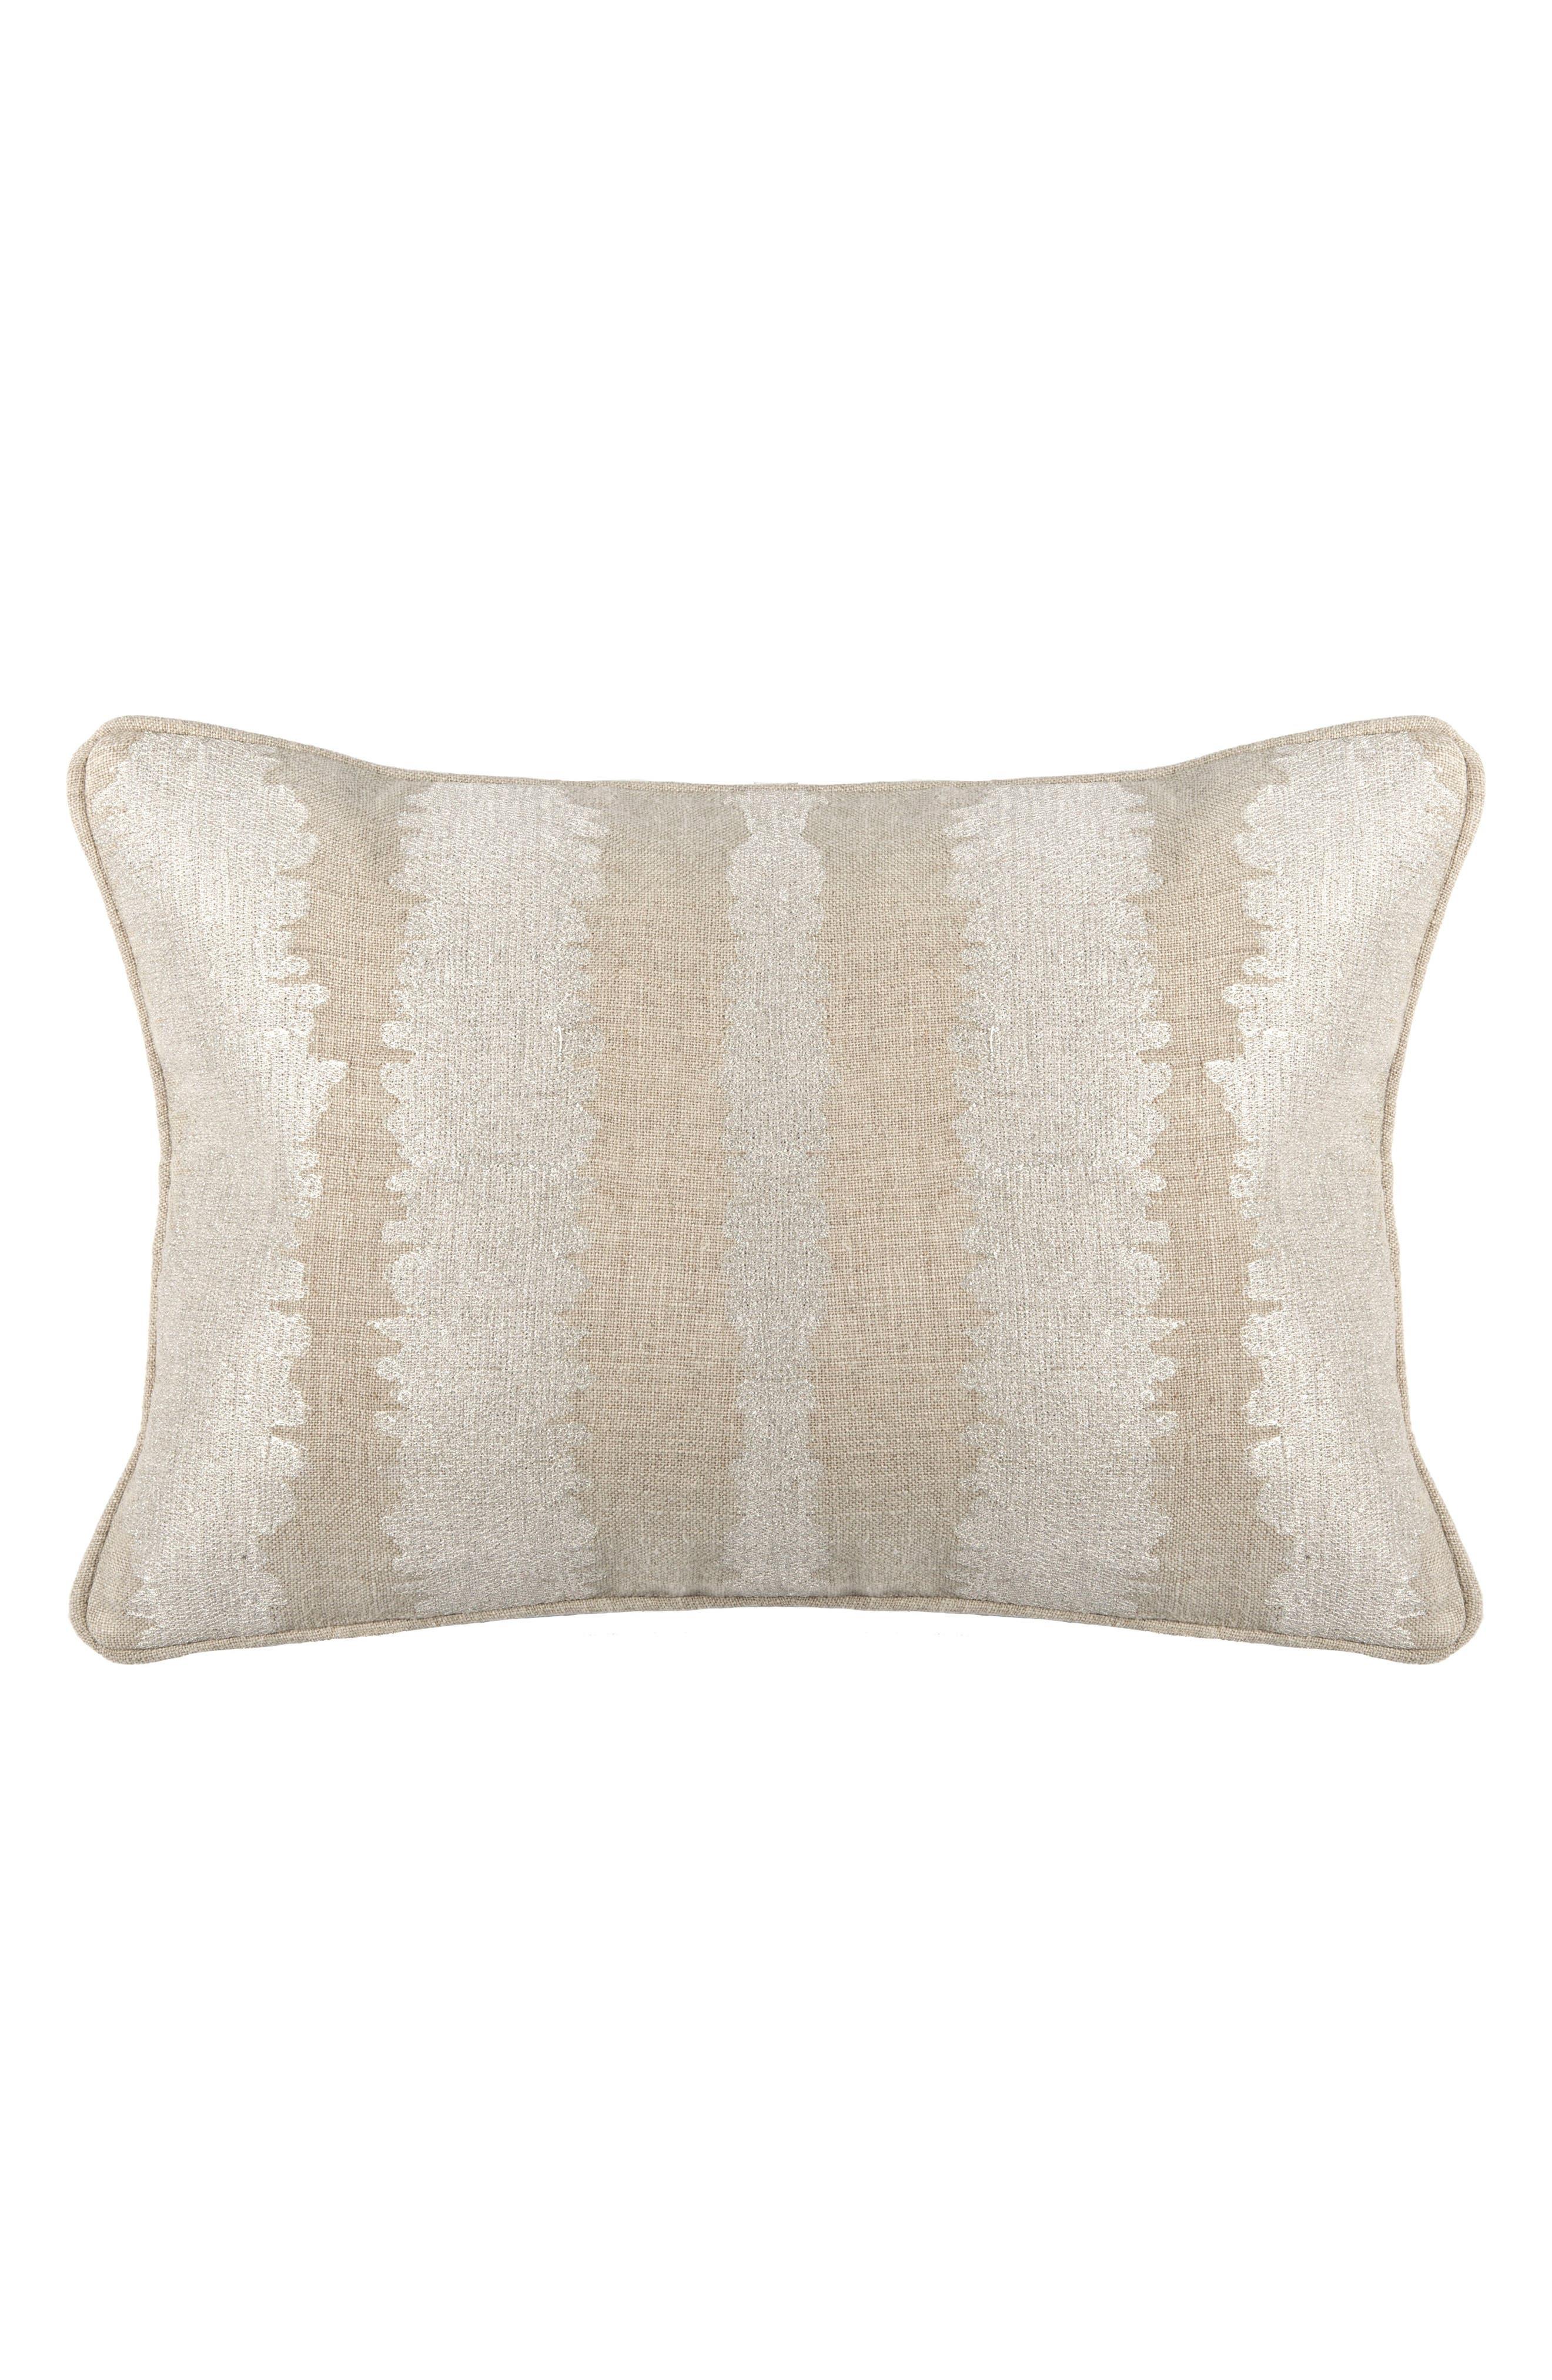 Alternate Image 1 Selected - Villa Home Collection Mena Pillow